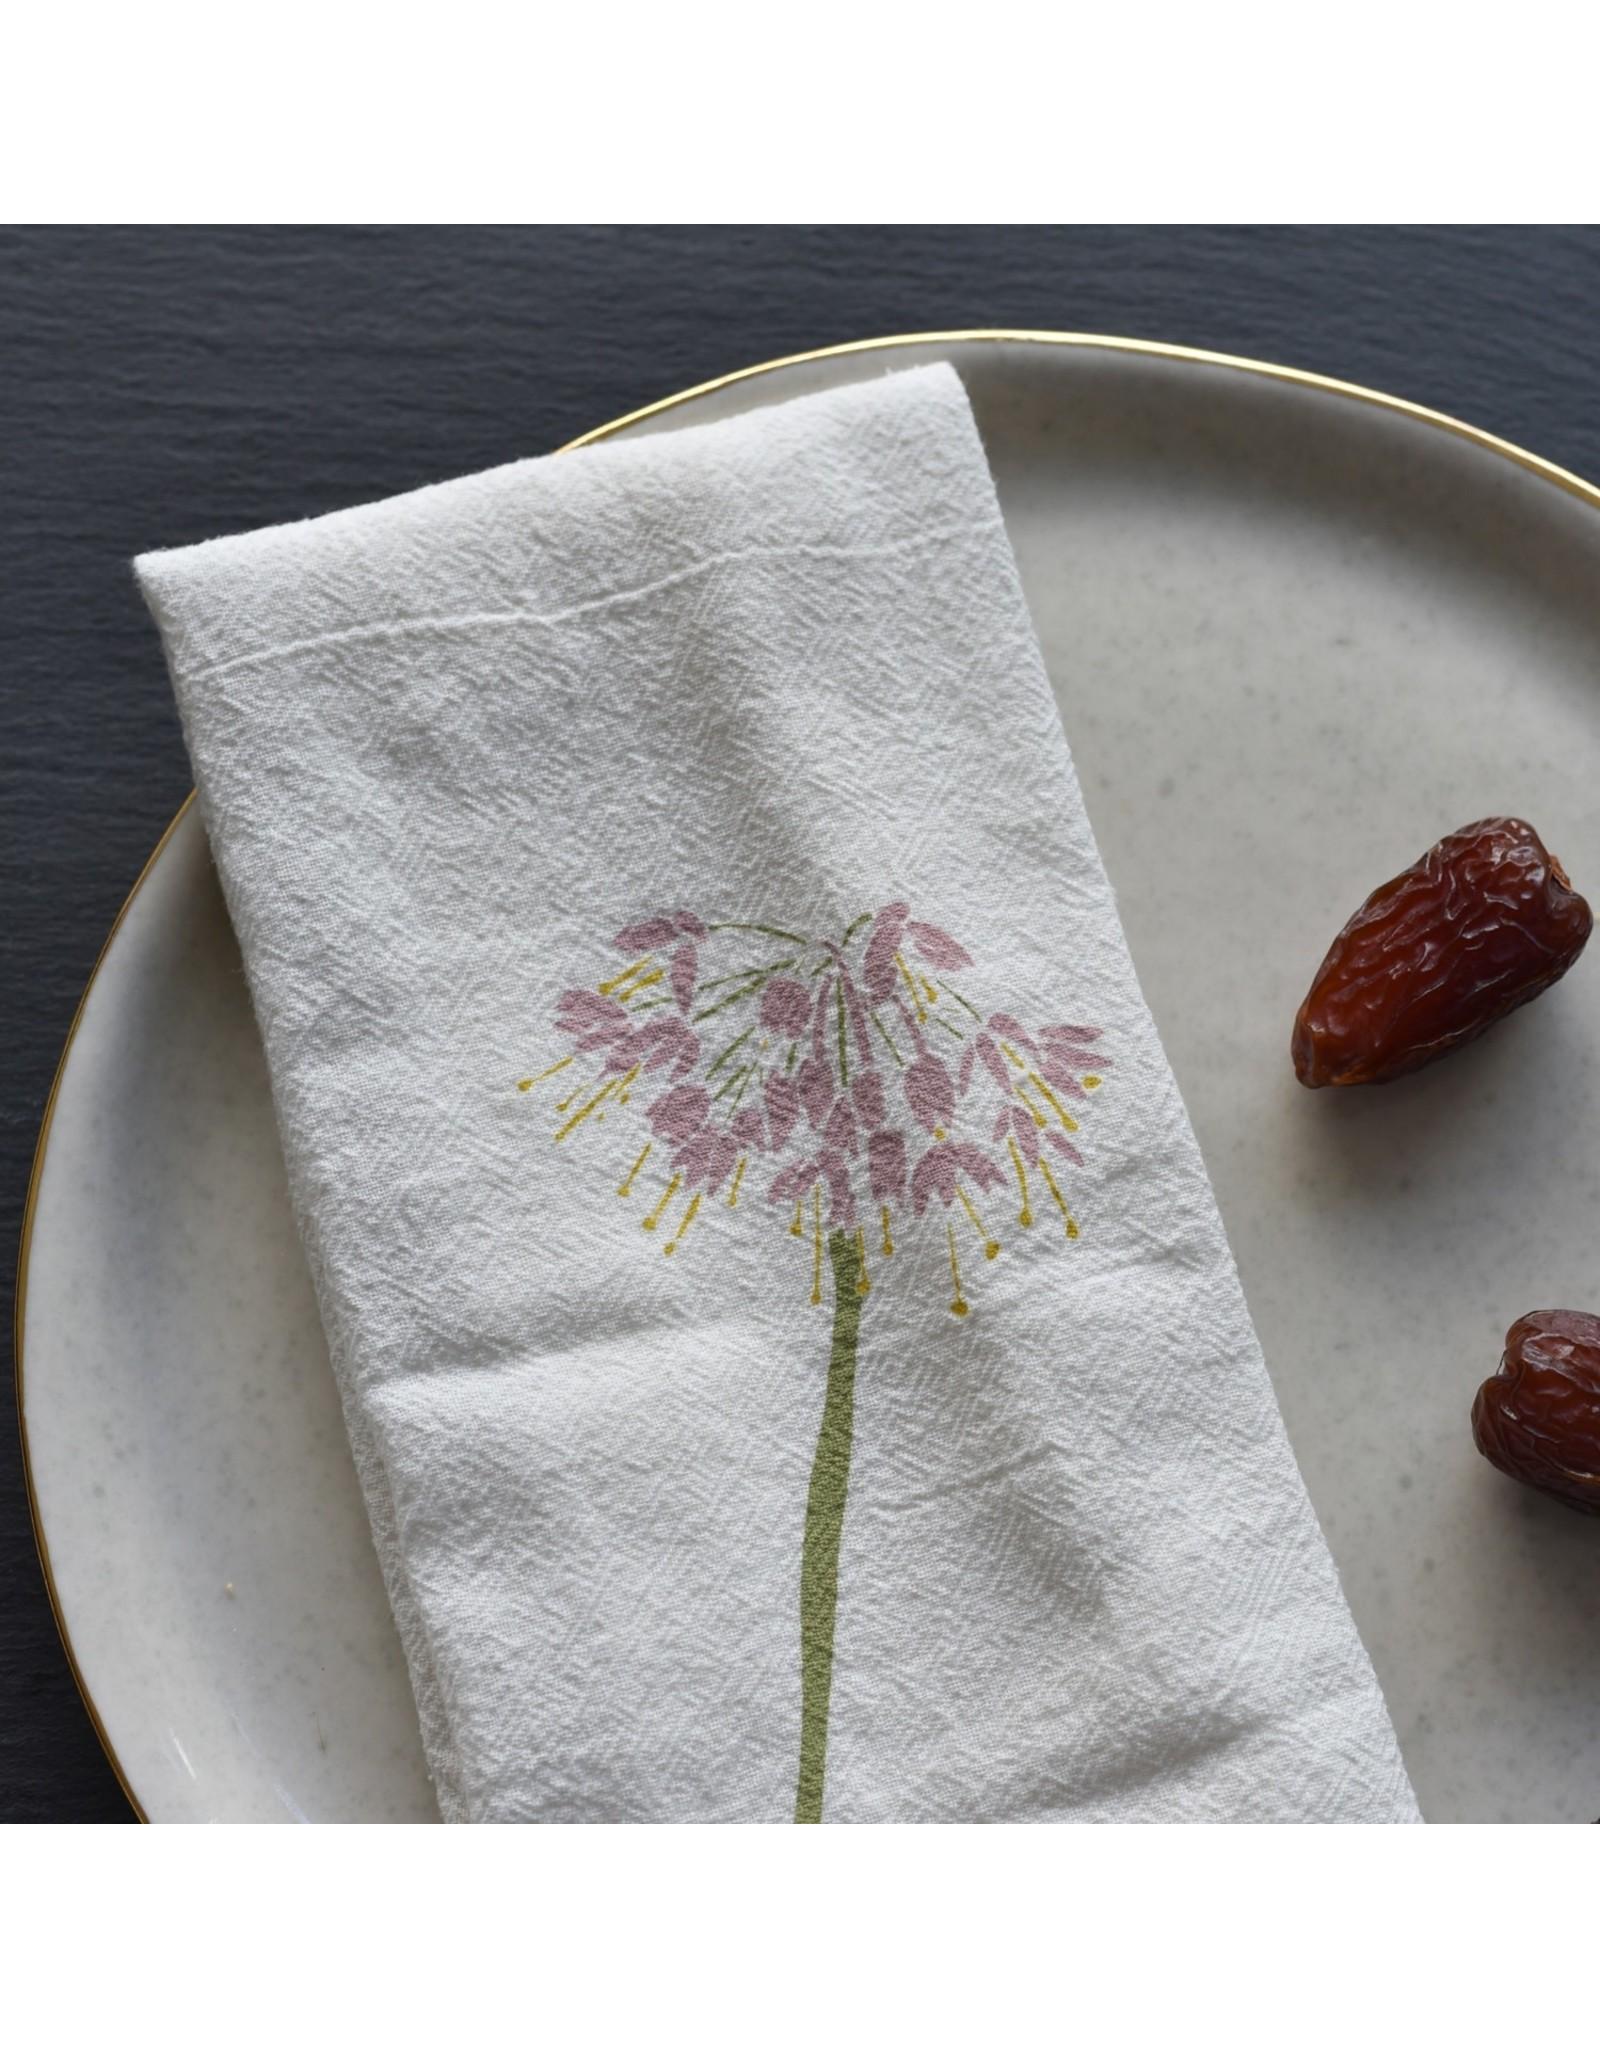 June & December Thistle + Wild Onion Napkins Set of 4